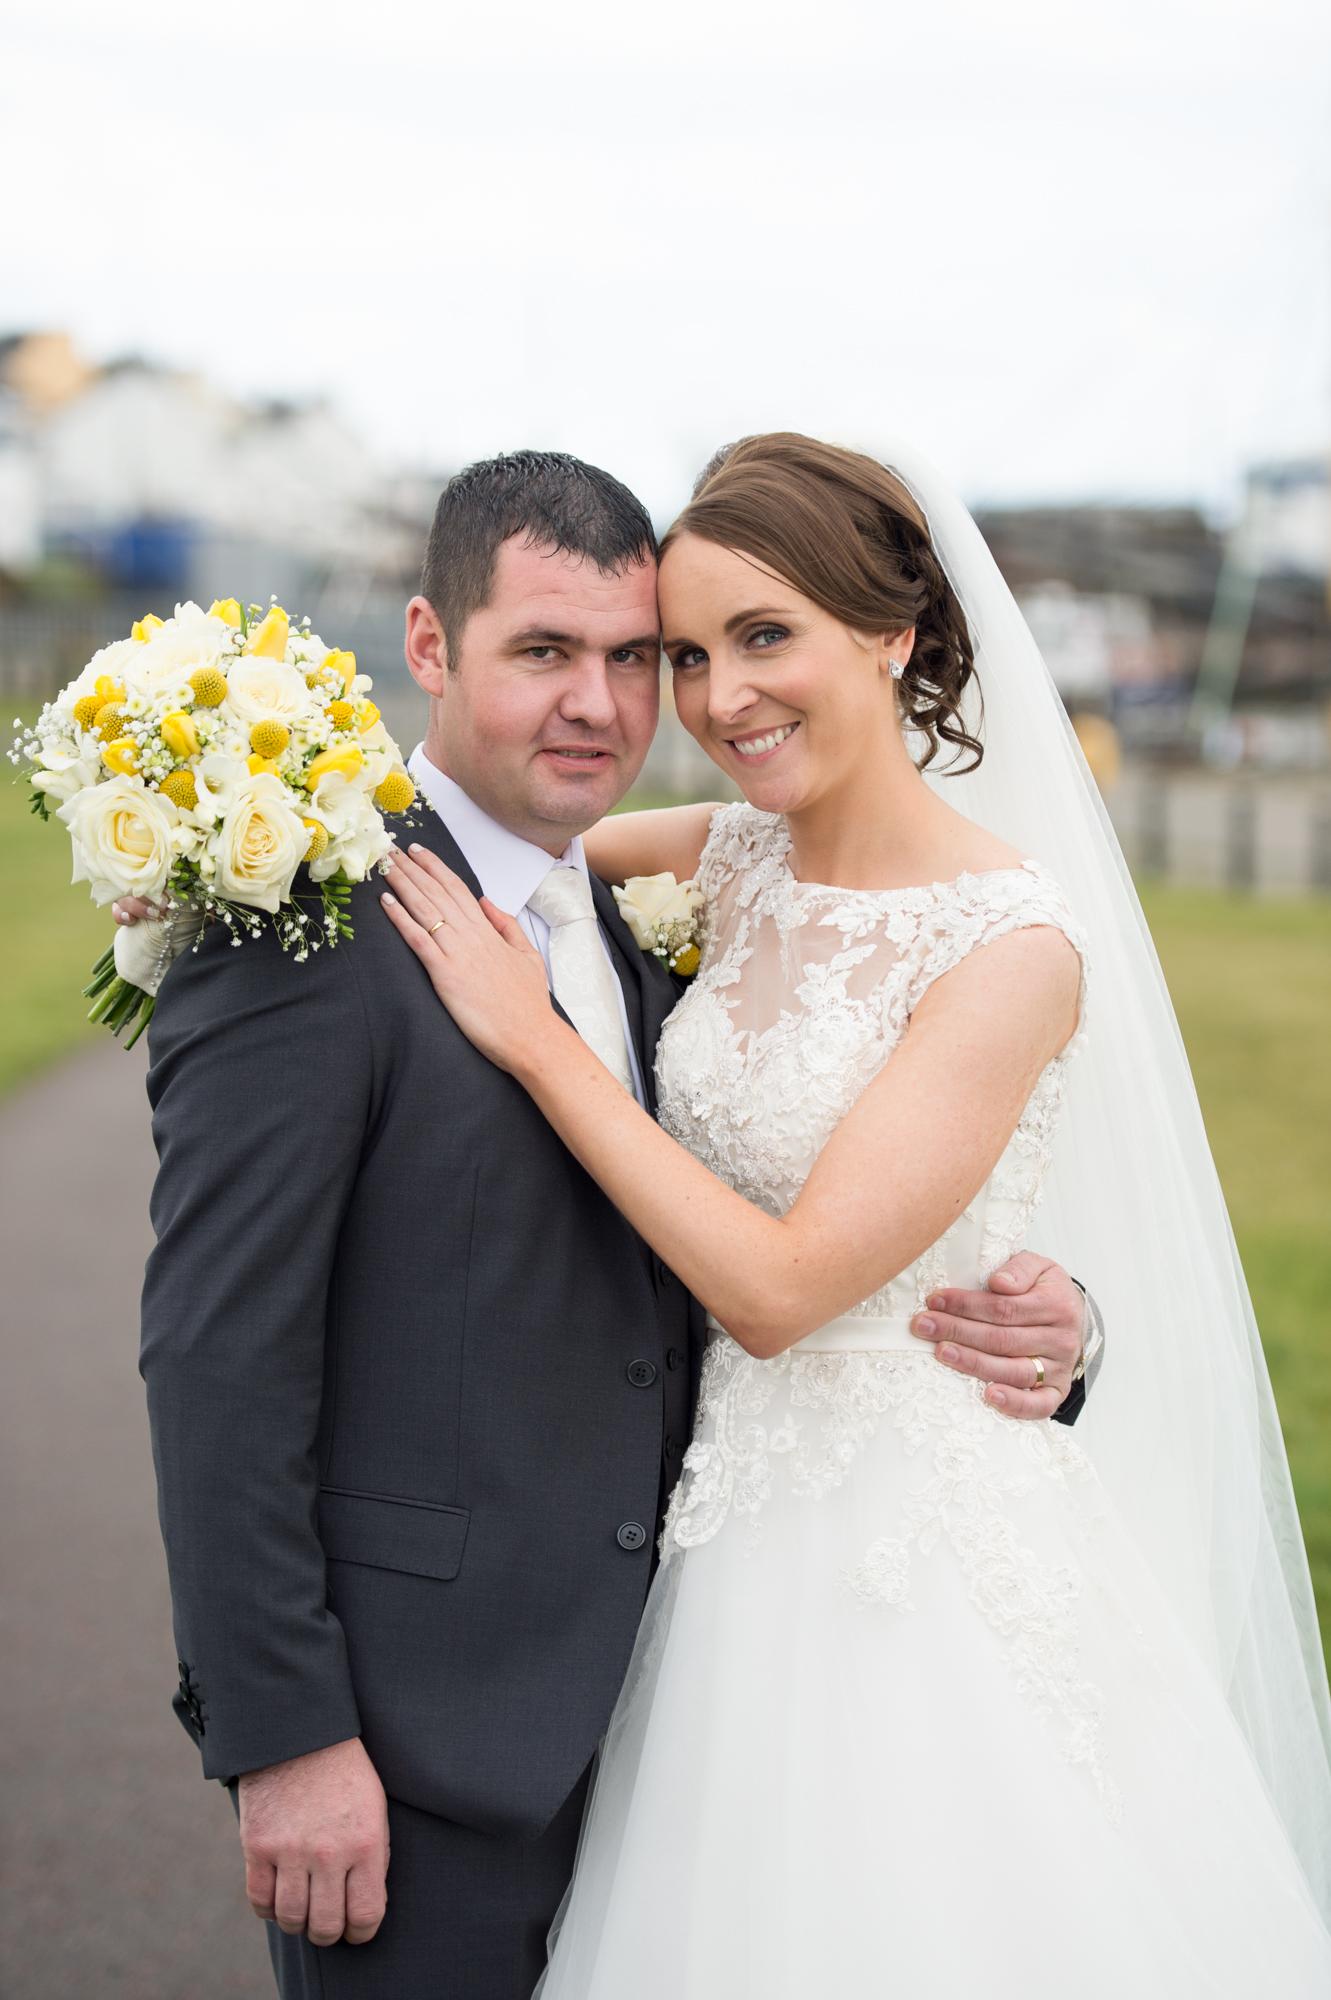 Michael_Gill_Photography_Wedding_Greencastle_Lousie_Jason_Donegal-12.jpg